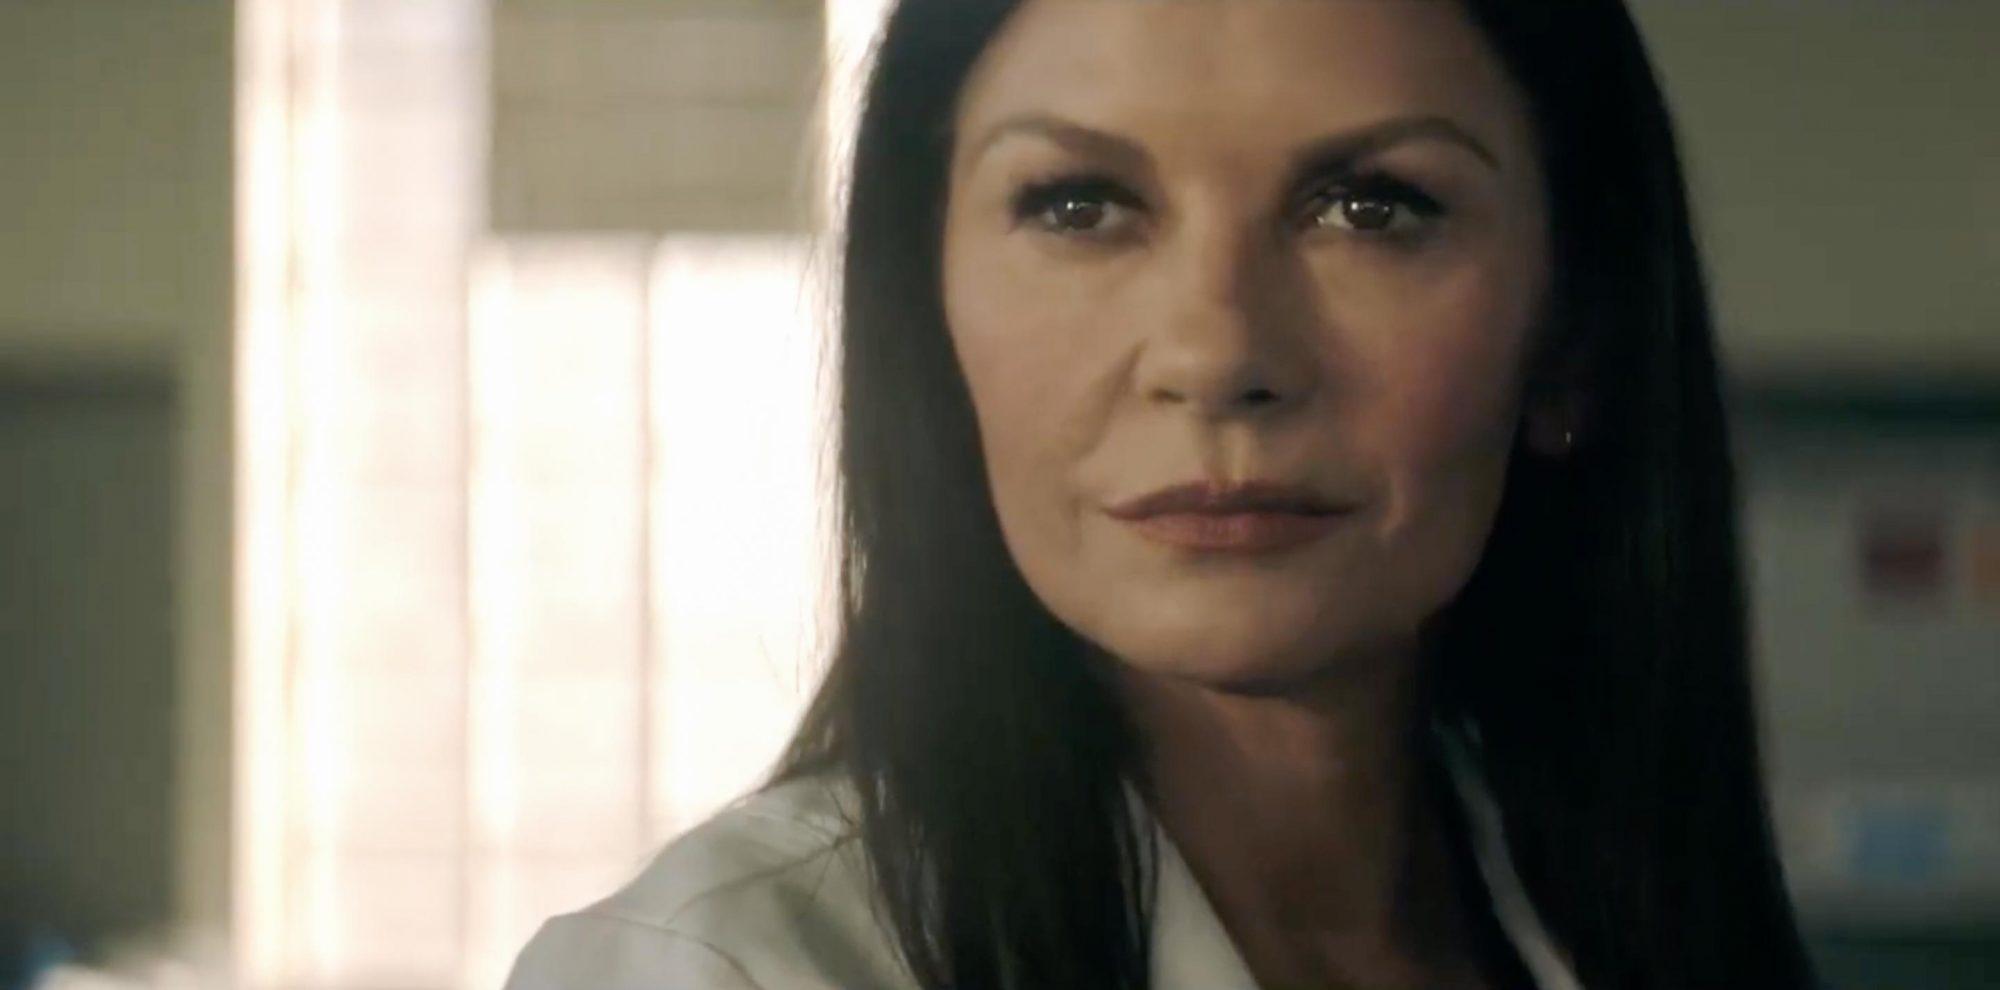 Watch Catherine Zeta-Jones take on Michael Sheen in exclusive Prodigal Son